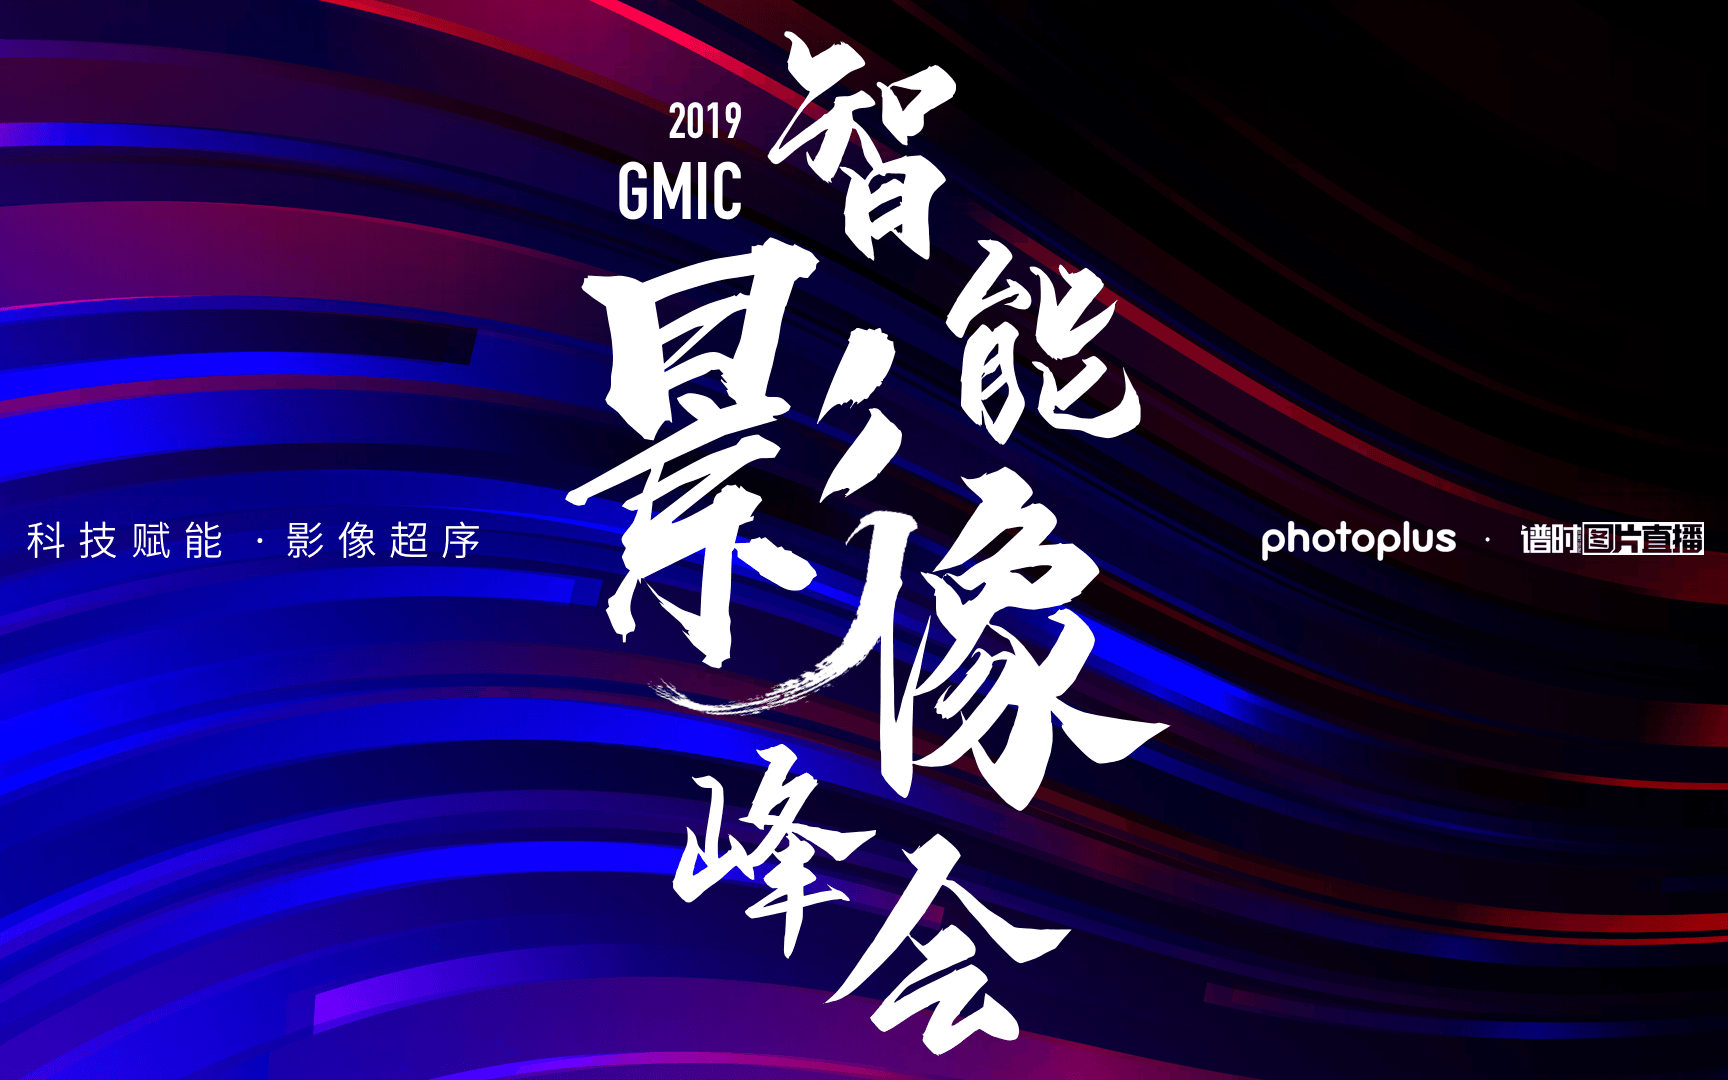 2019GMIC智能影像峰会(广州)